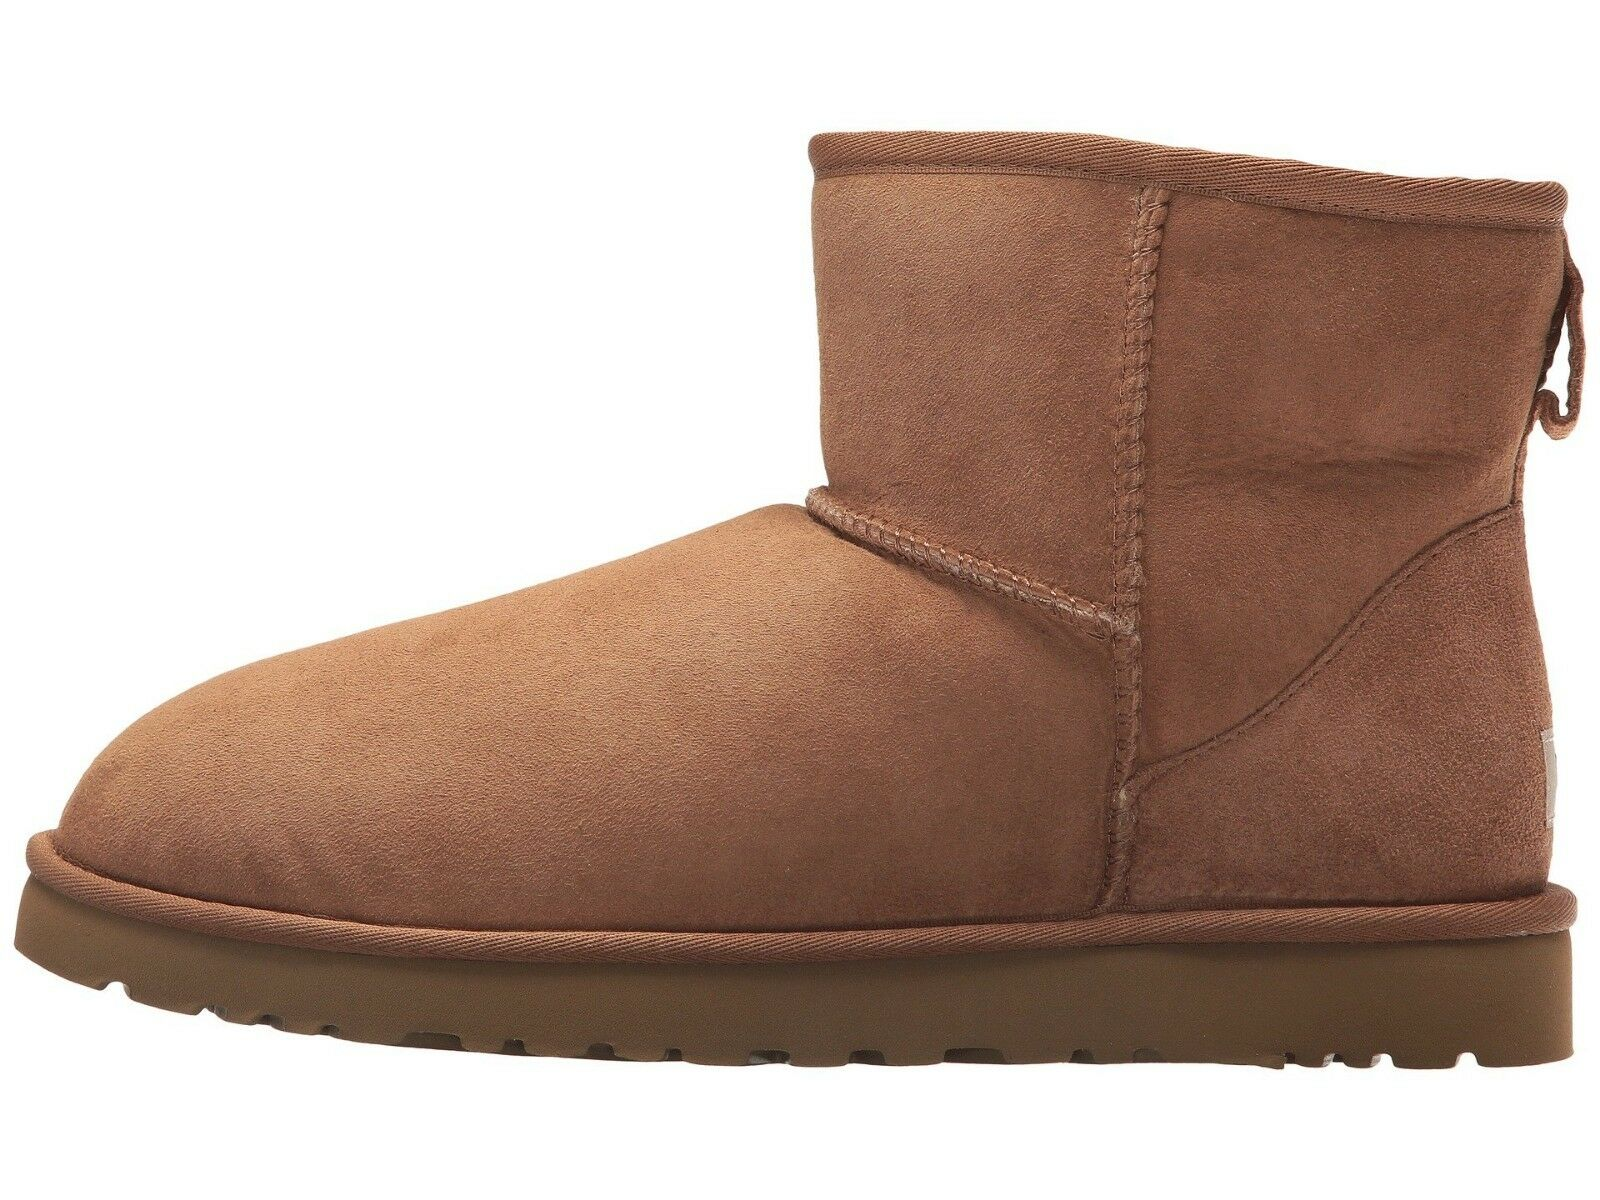 UGG Men's CLASSIC MINI Sheepskin & Suede Winter Boots CHESTNUT 1002072